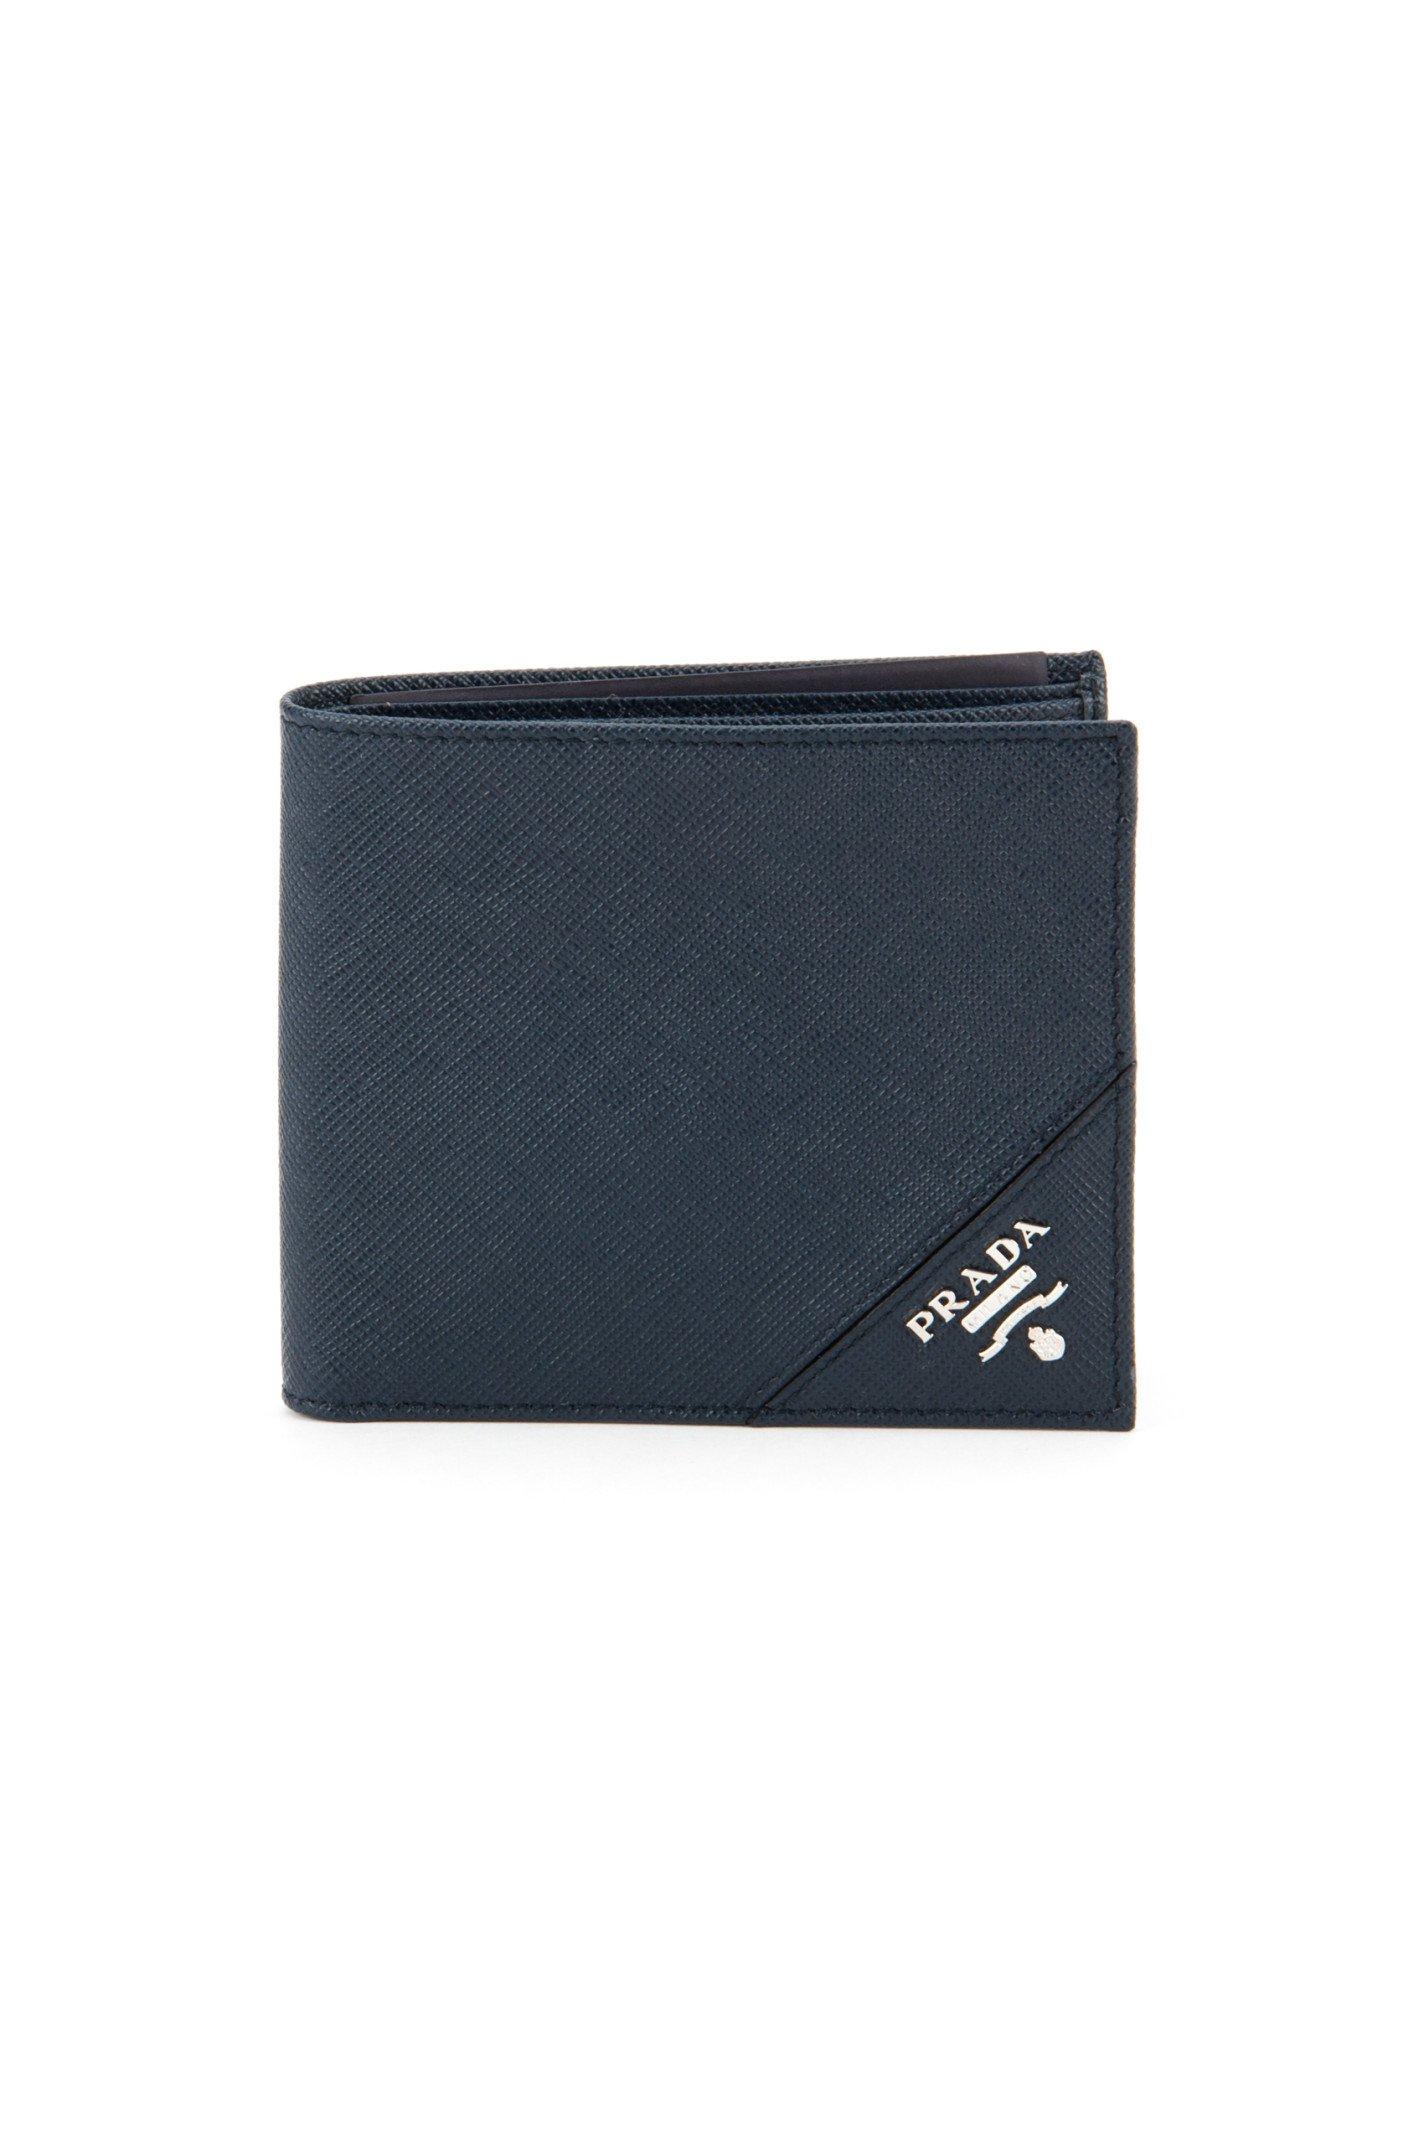 Prada Saffiano Wallet in Blue for Men (BALTICO) | Lyst